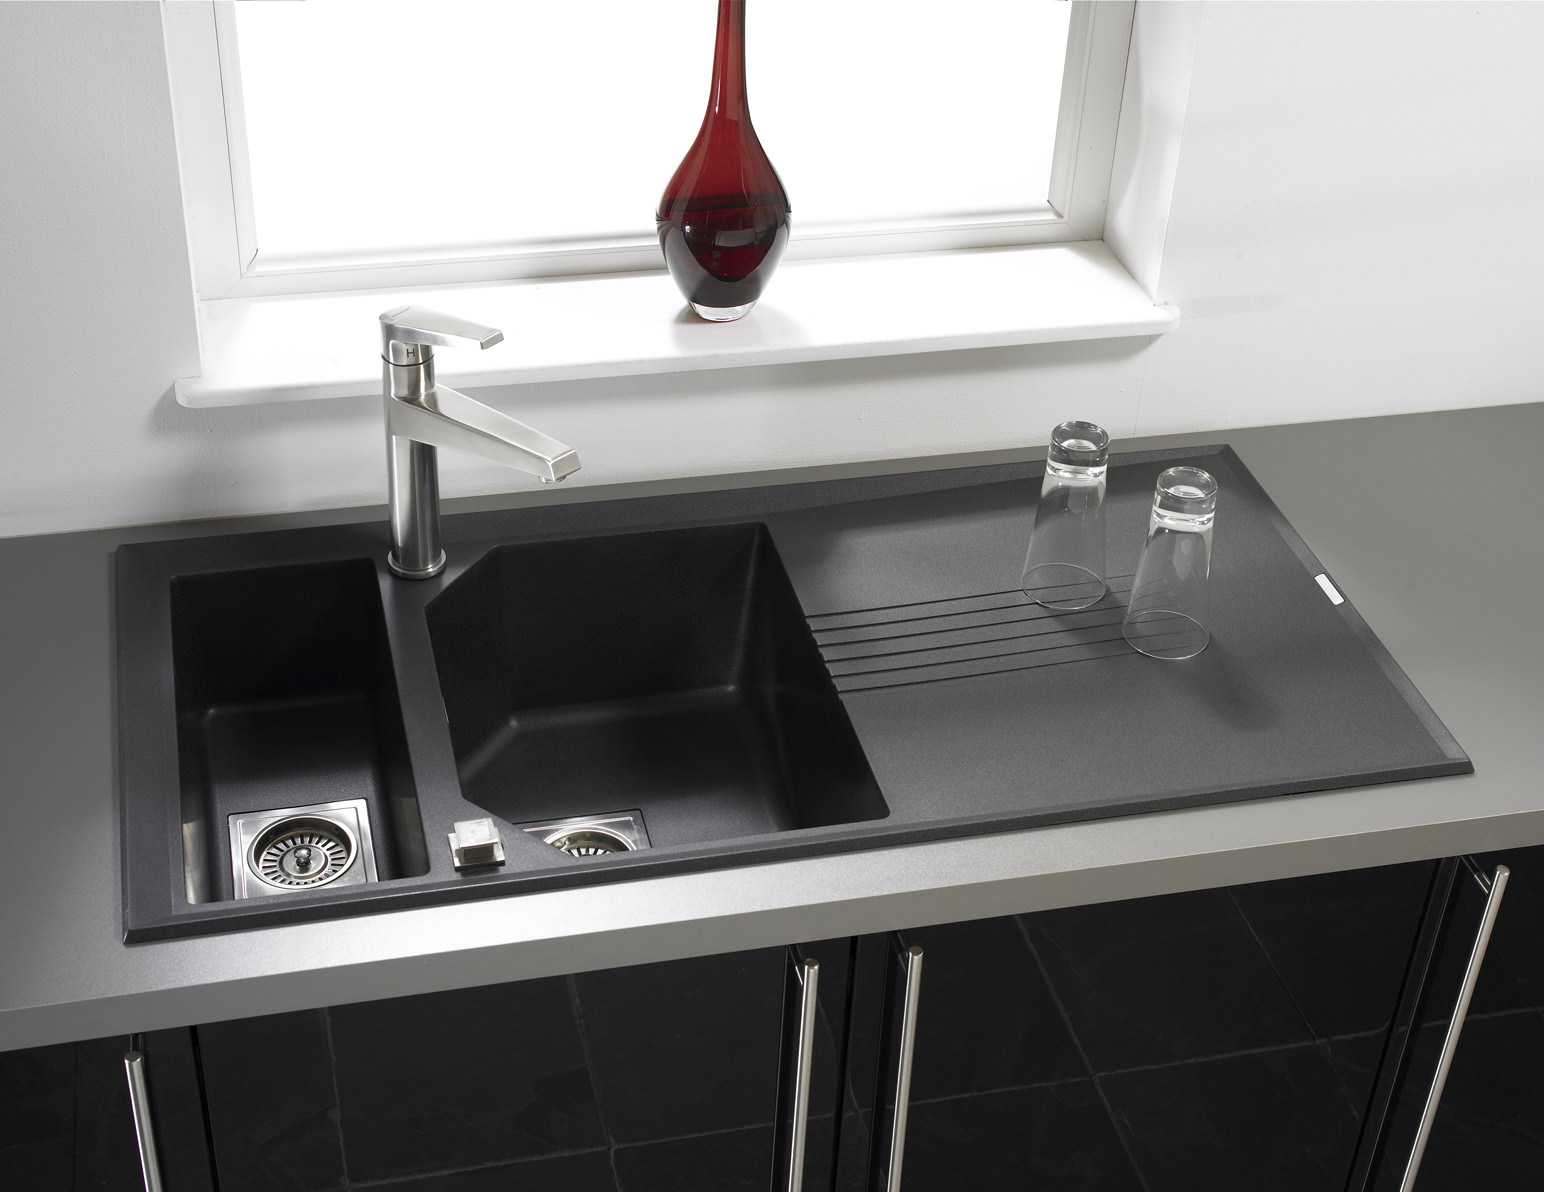 Astracast Helix 15 Bowl Composite ROK Metallic Inset Sink  LO15RZHOMESK